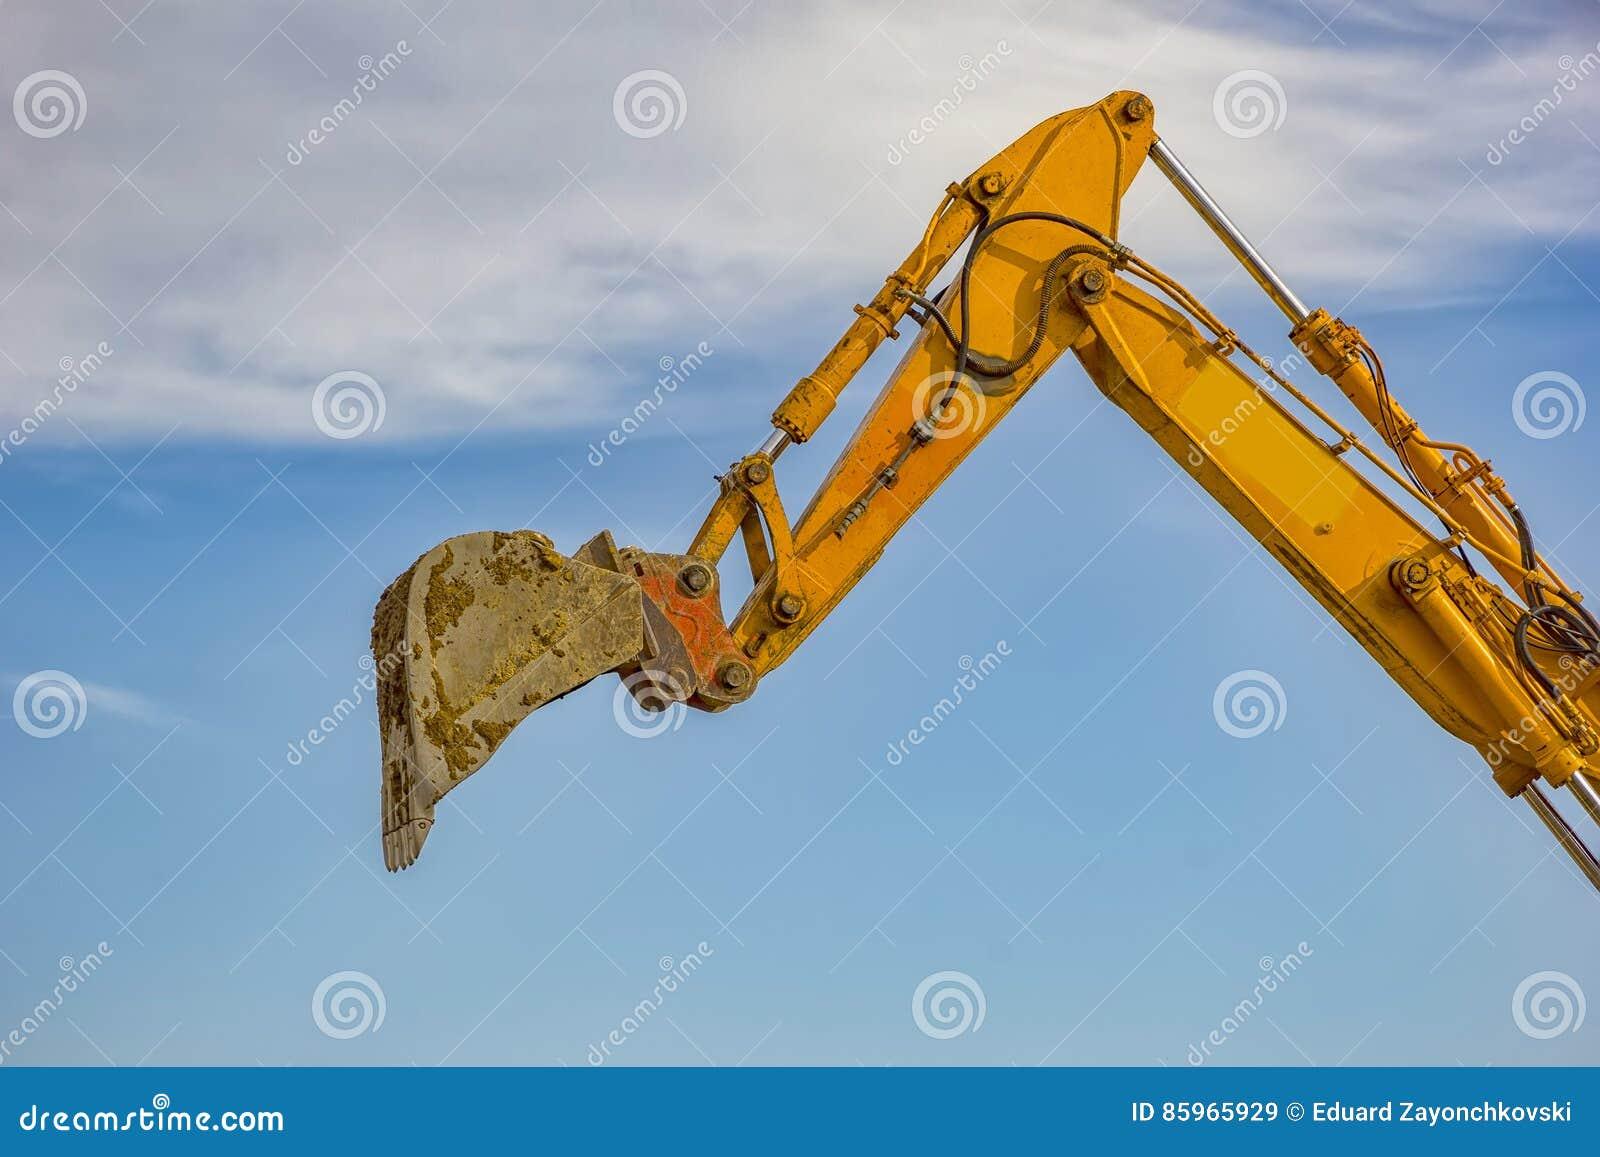 Single excavator boom arm stock image  Image of action